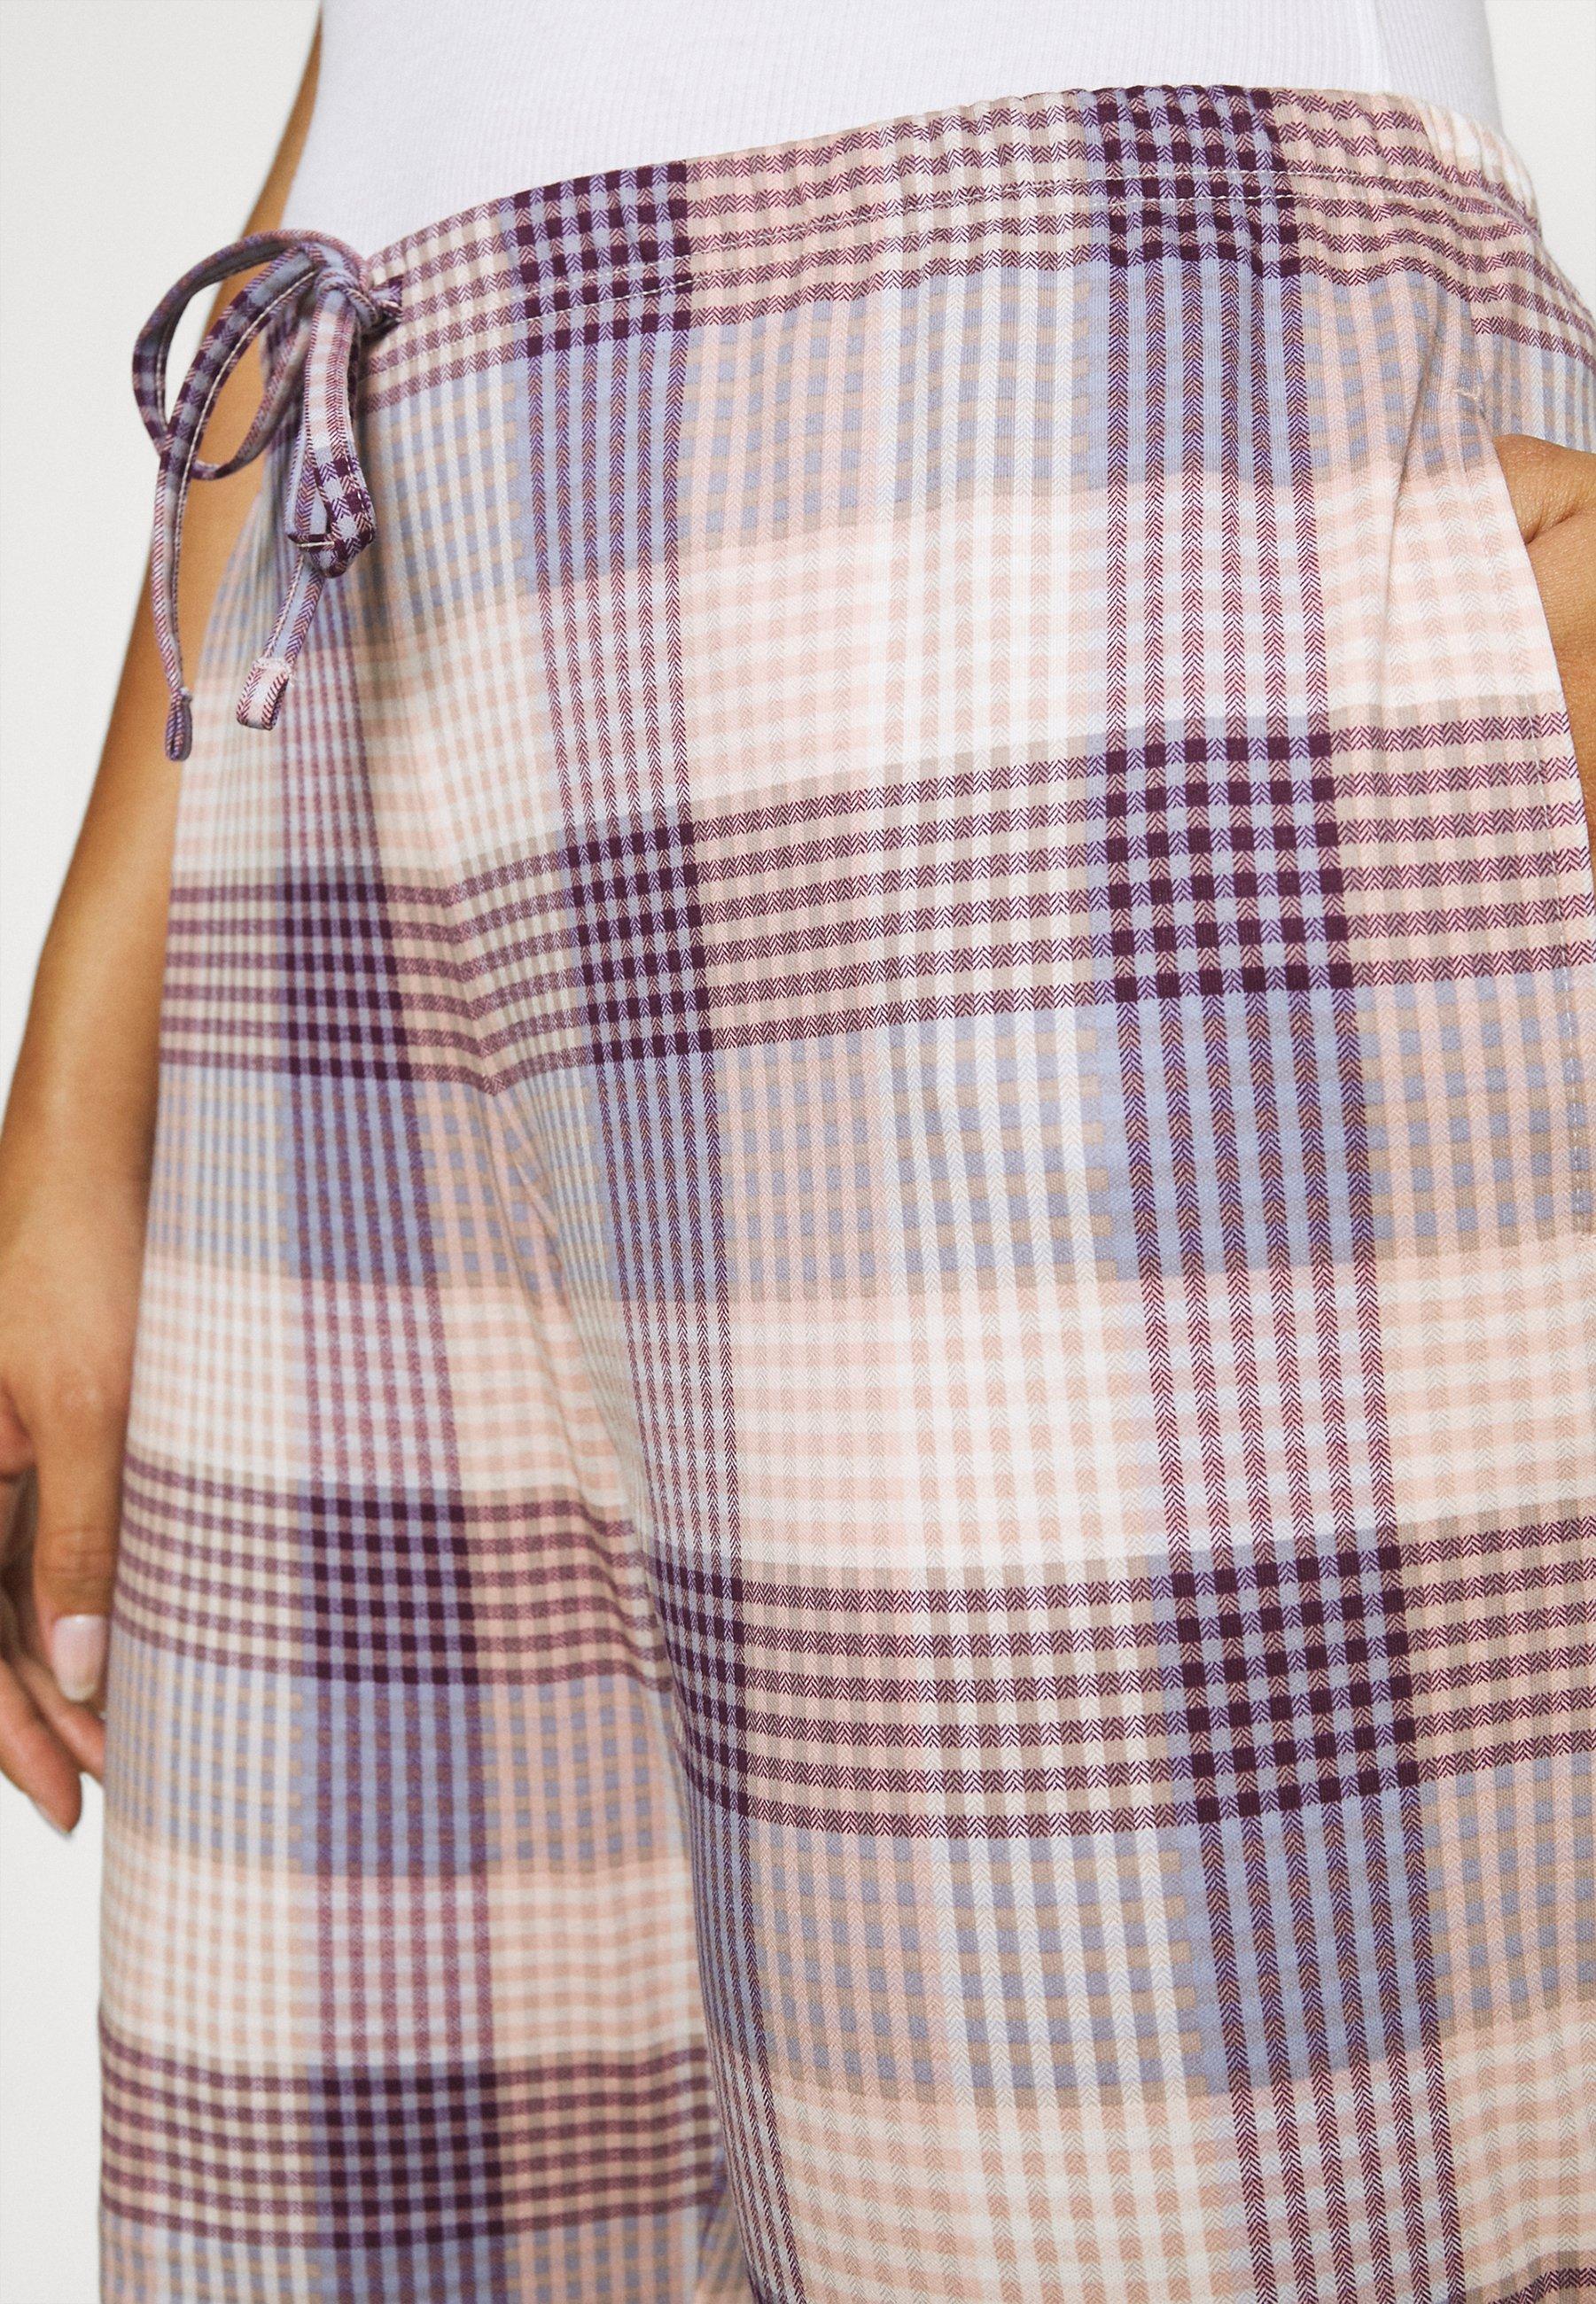 Donna FAVOURITES ELEGANCE - Pantaloni del pigiama